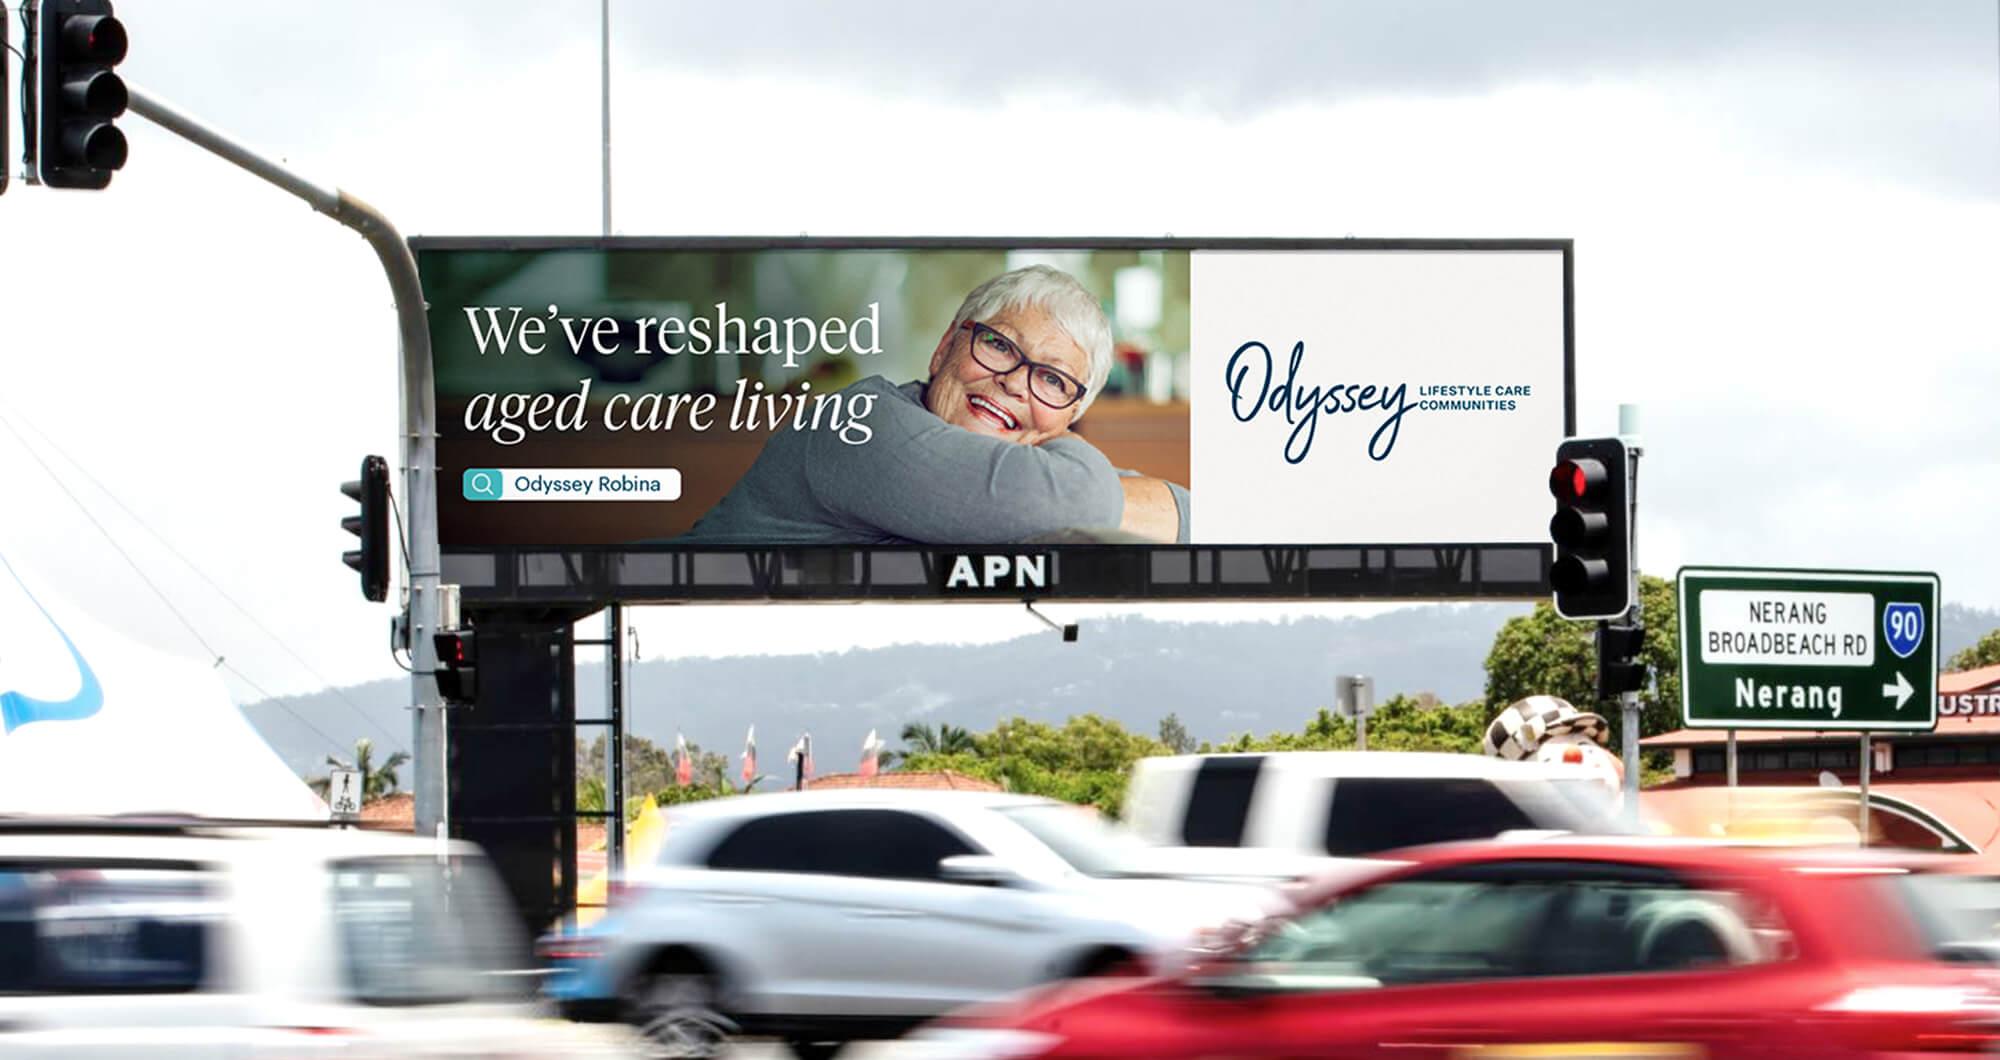 Odyssey Lifestyle Care Communities